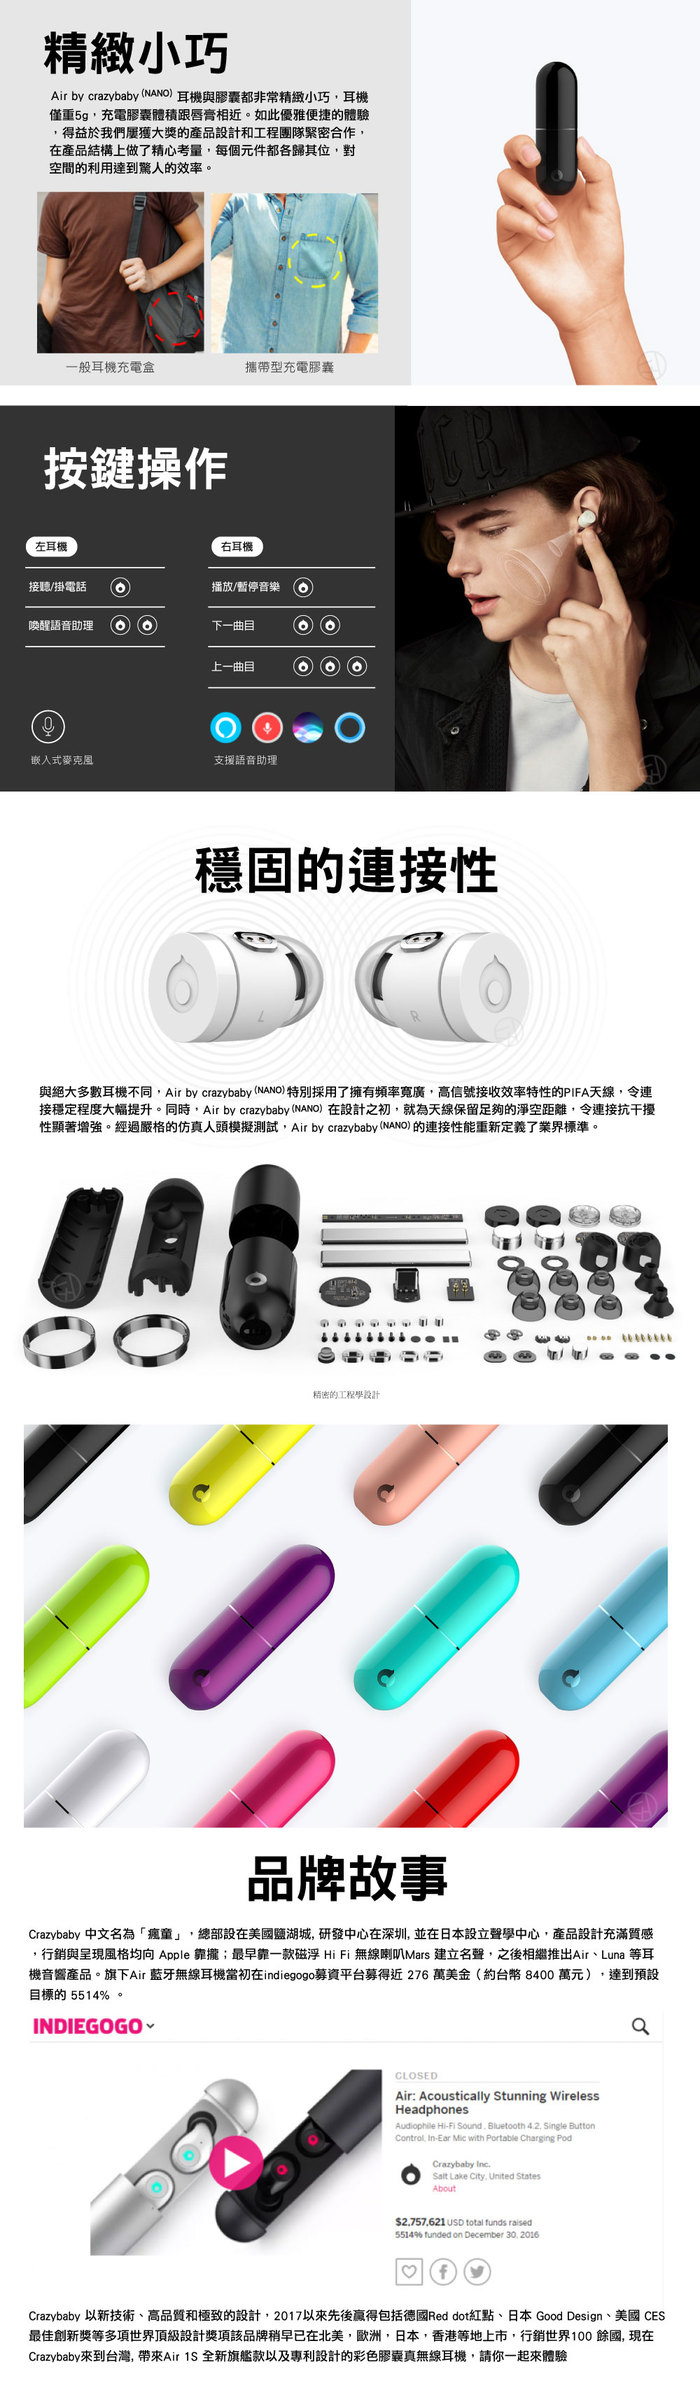 Crazybaby|Air Nano 彩色膠囊真無線耳機 - 黑